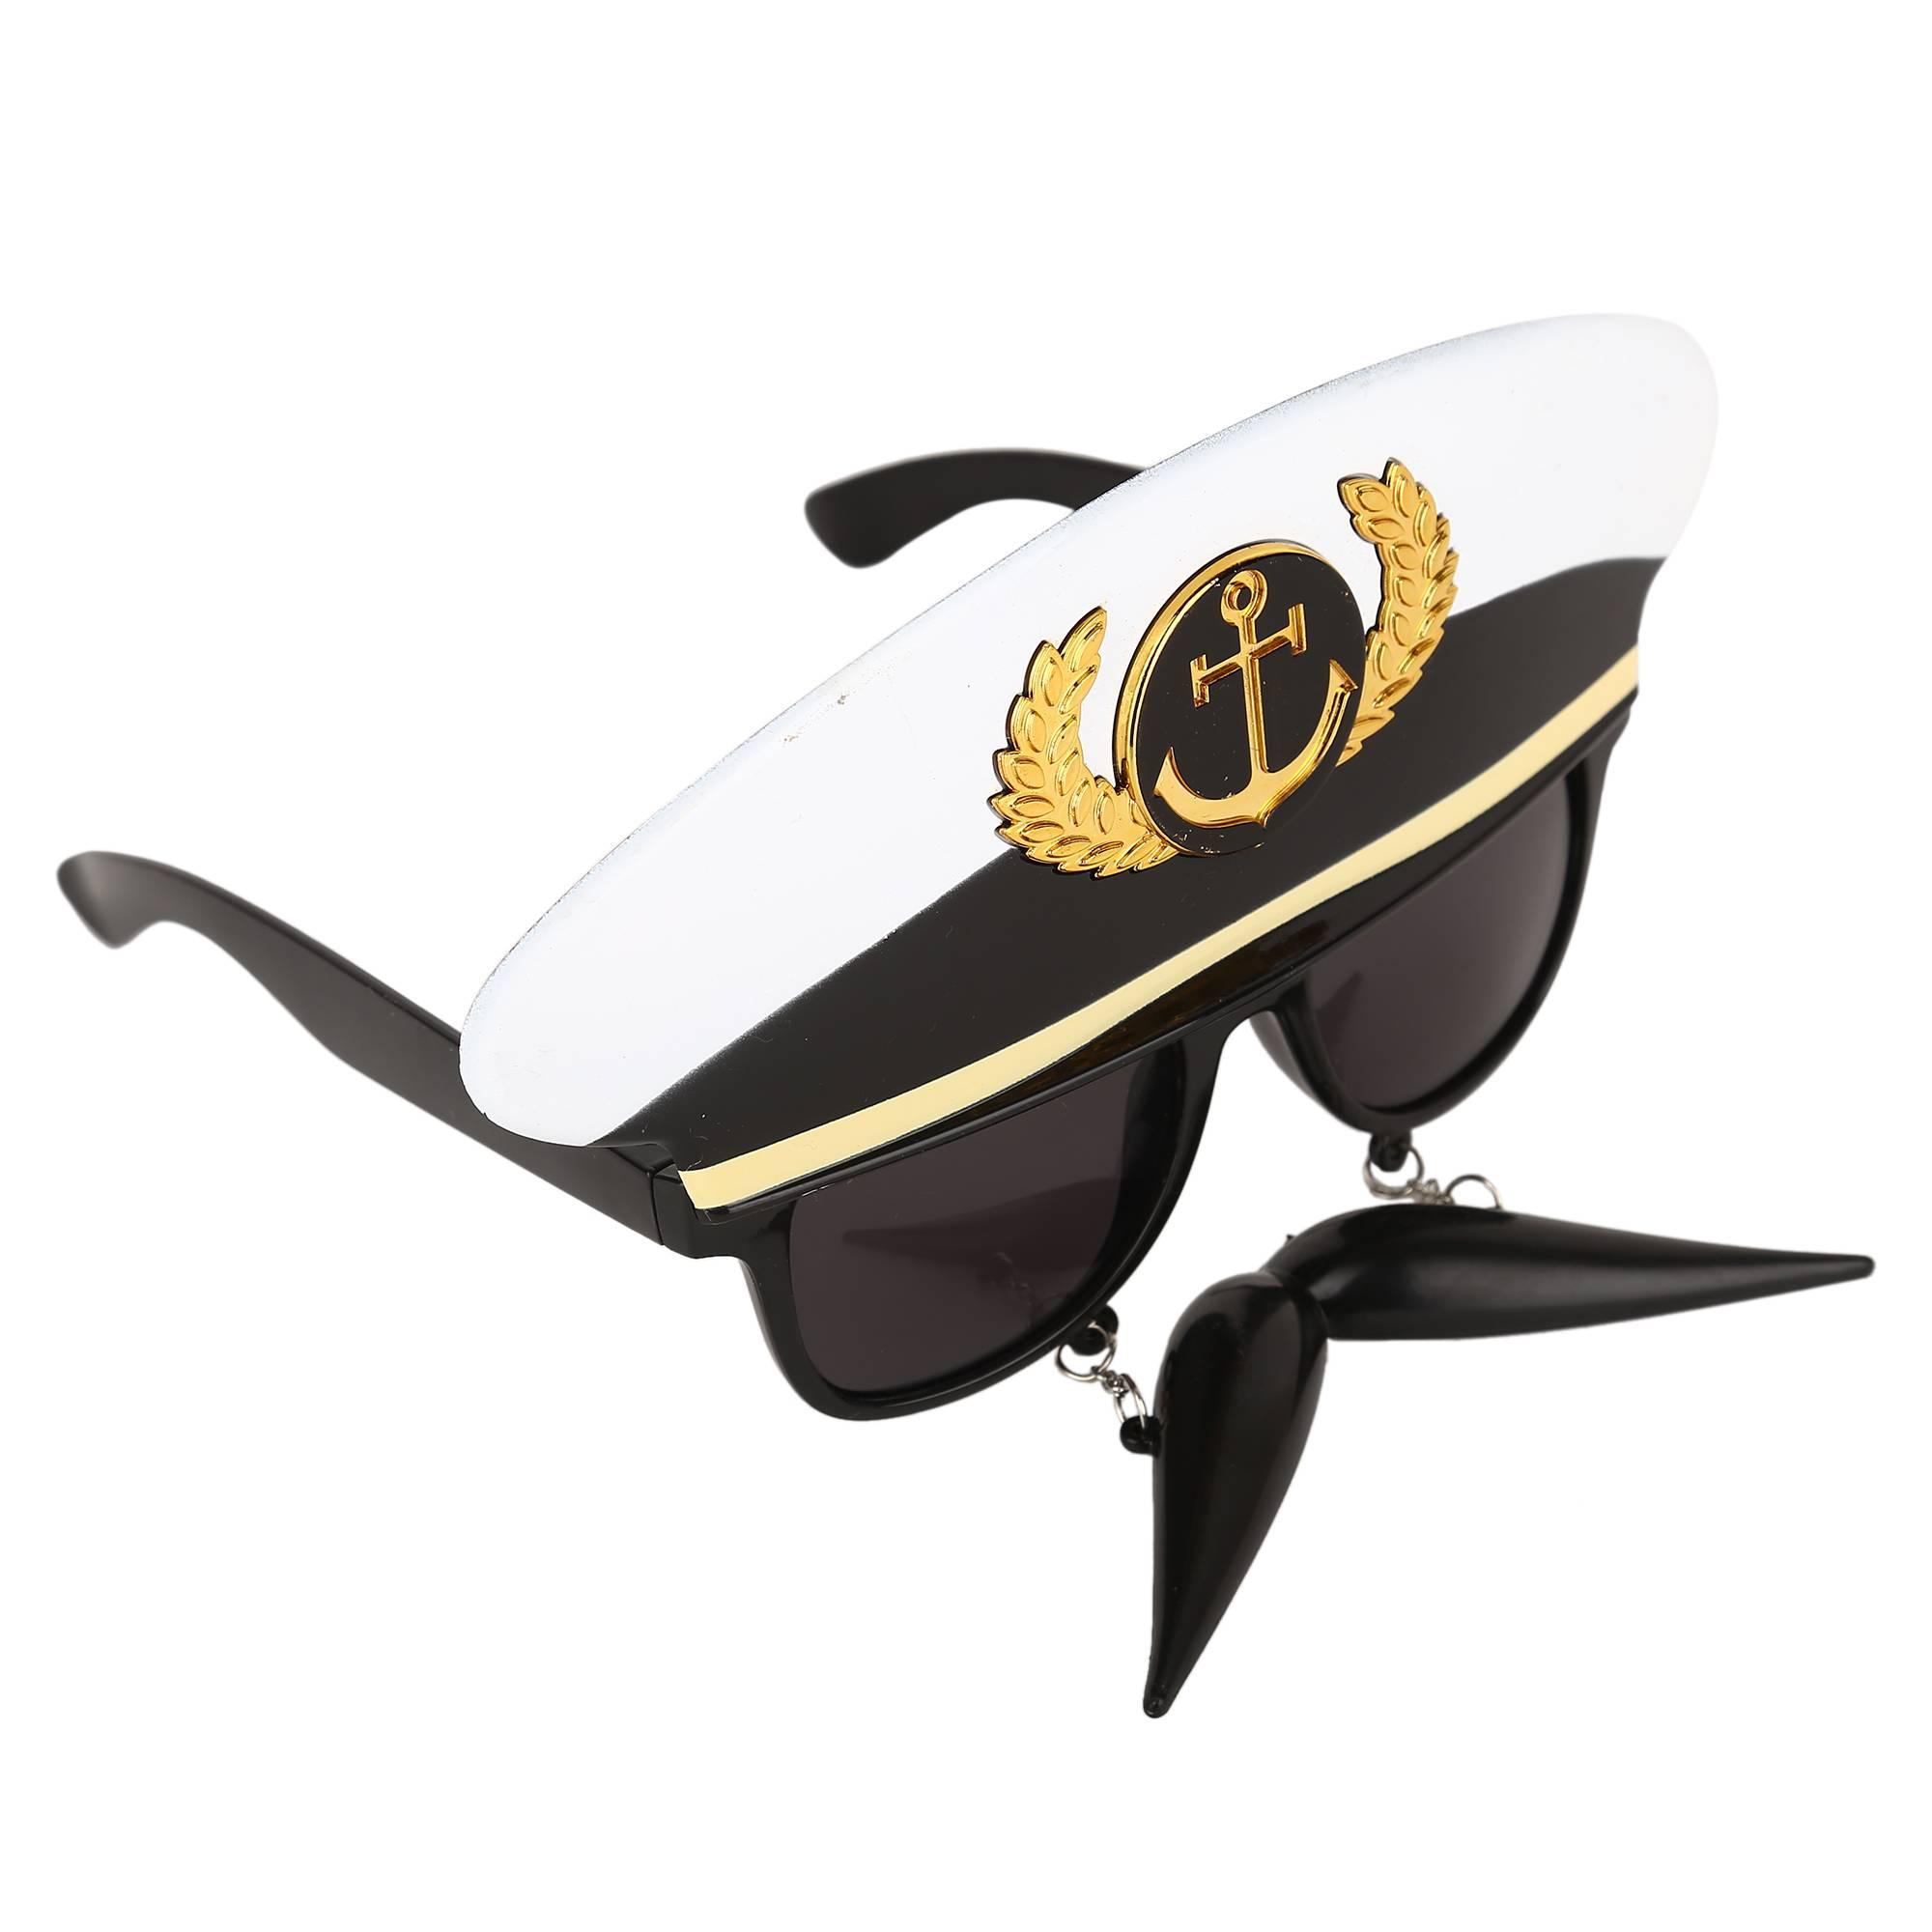 Navy Accessories Party Prop (PP-084)